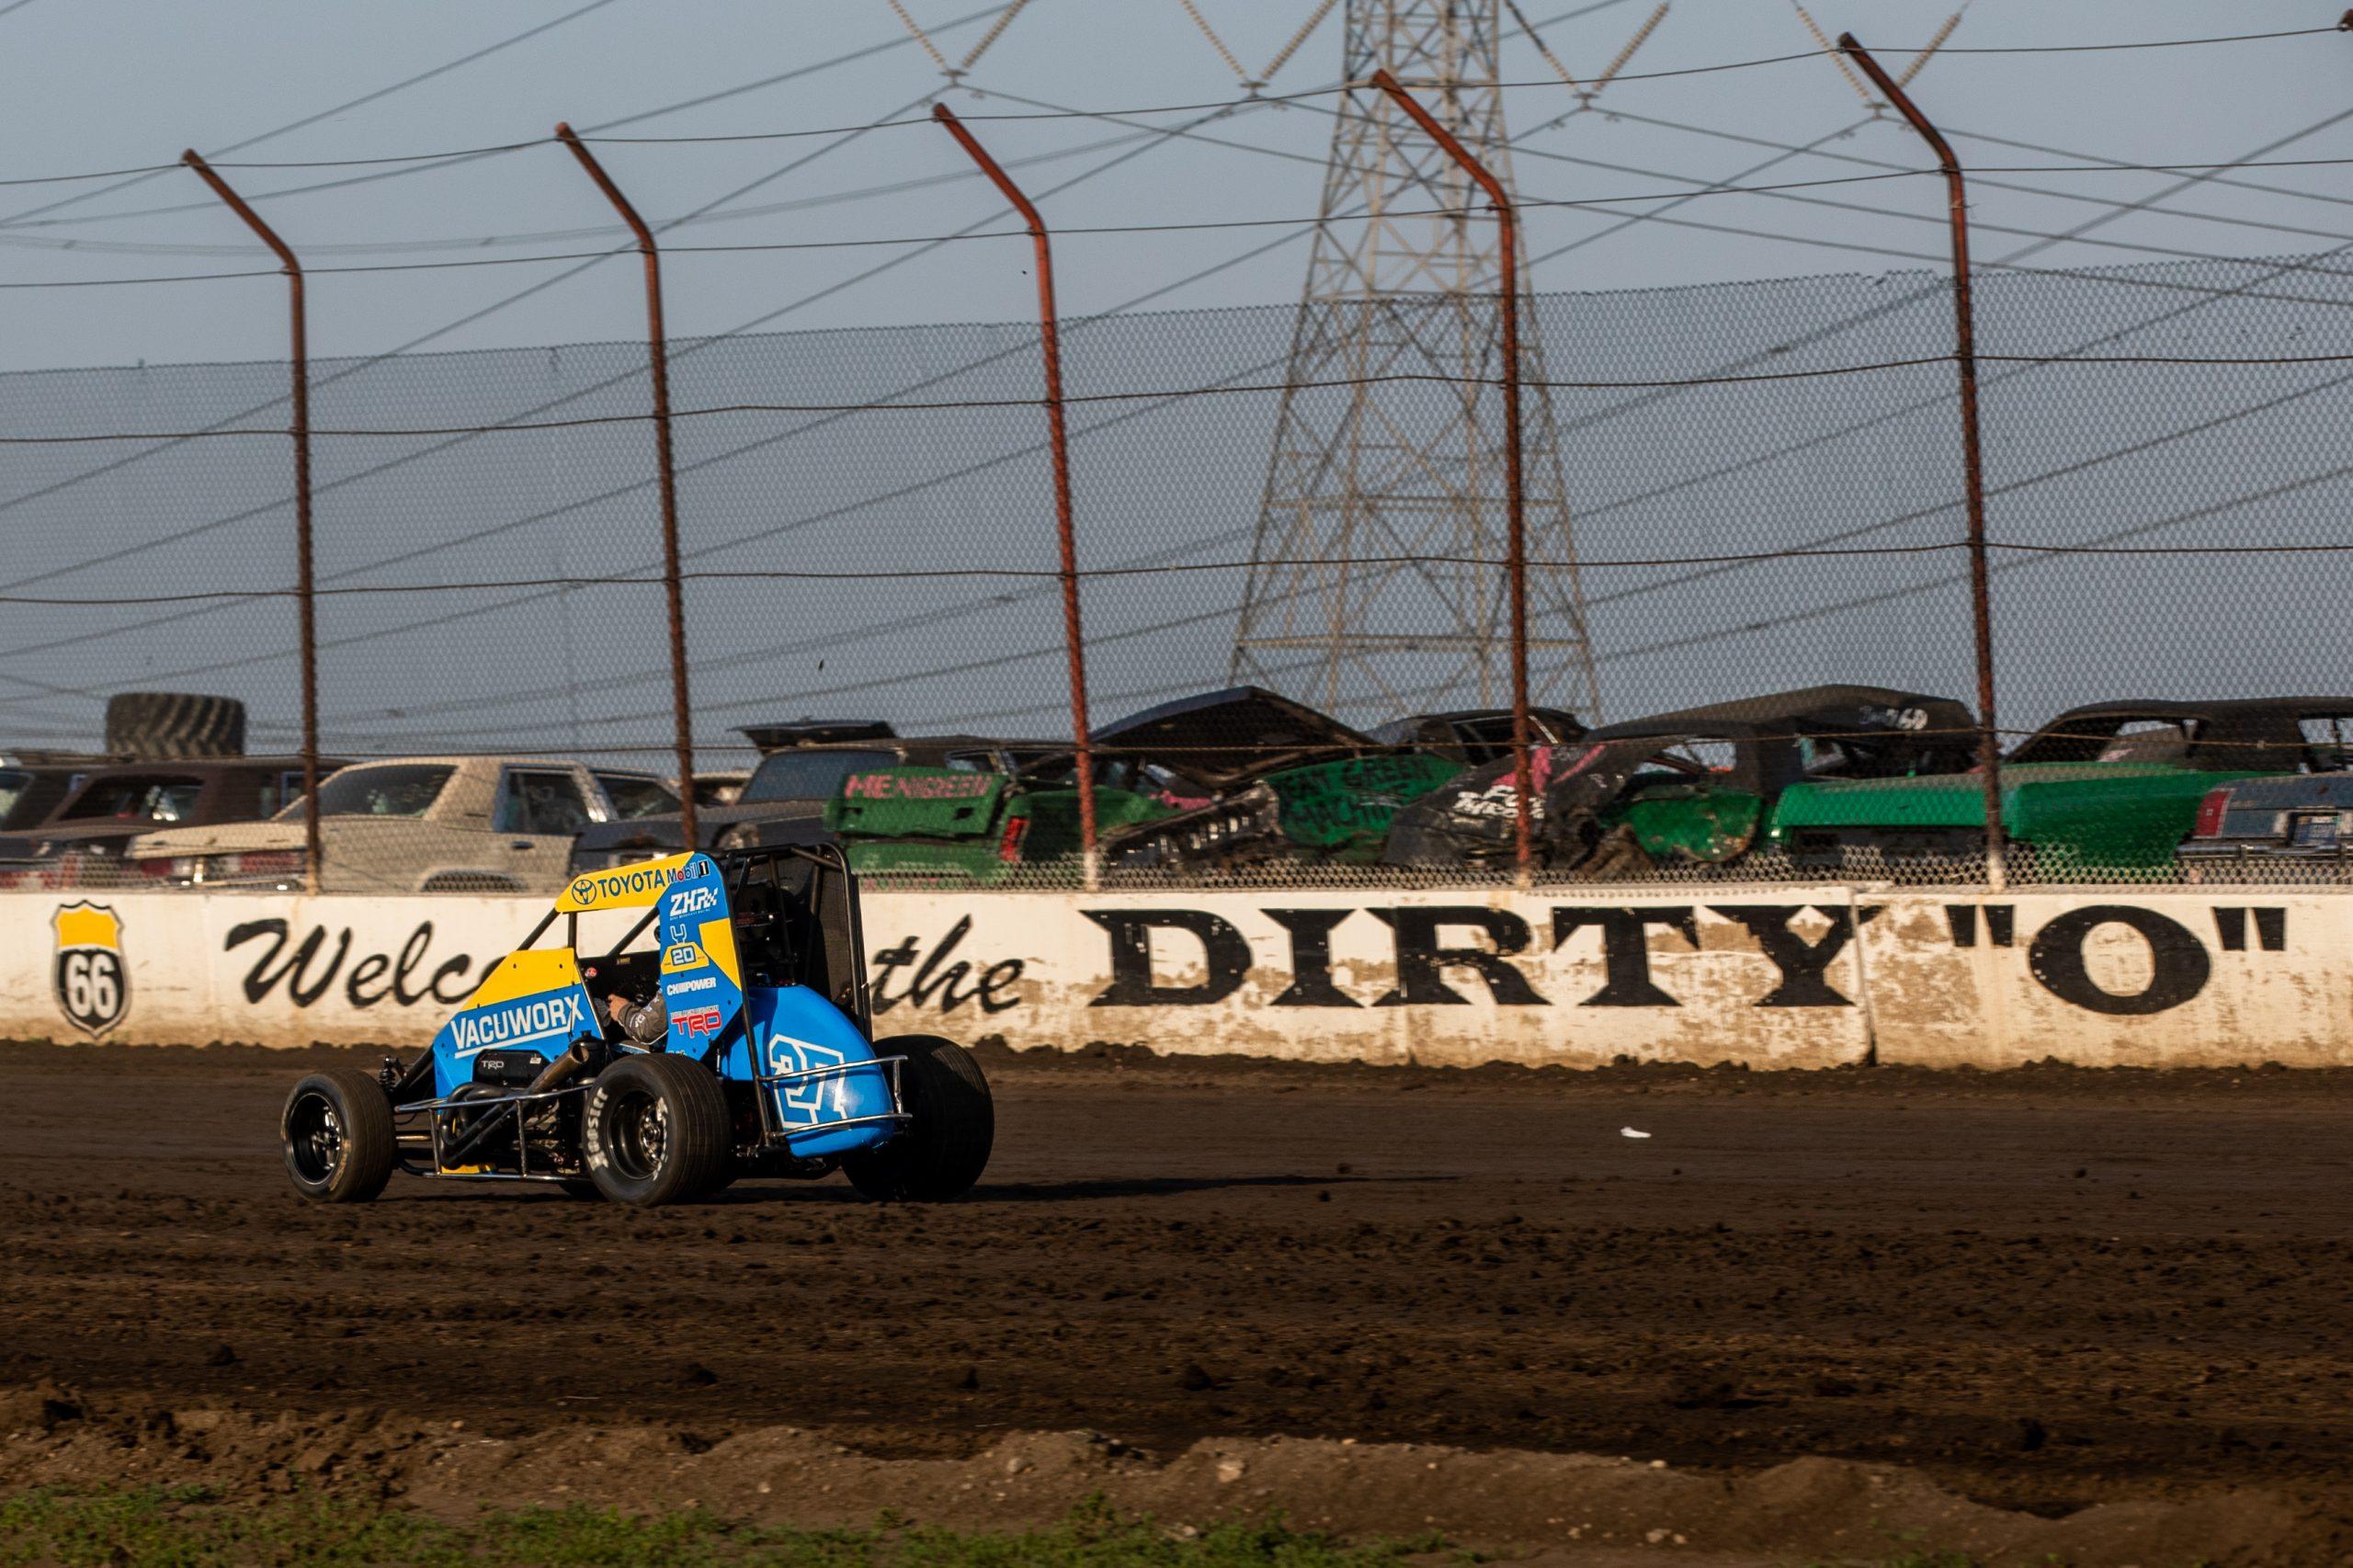 racecar dynamic rear three-quarter action on track